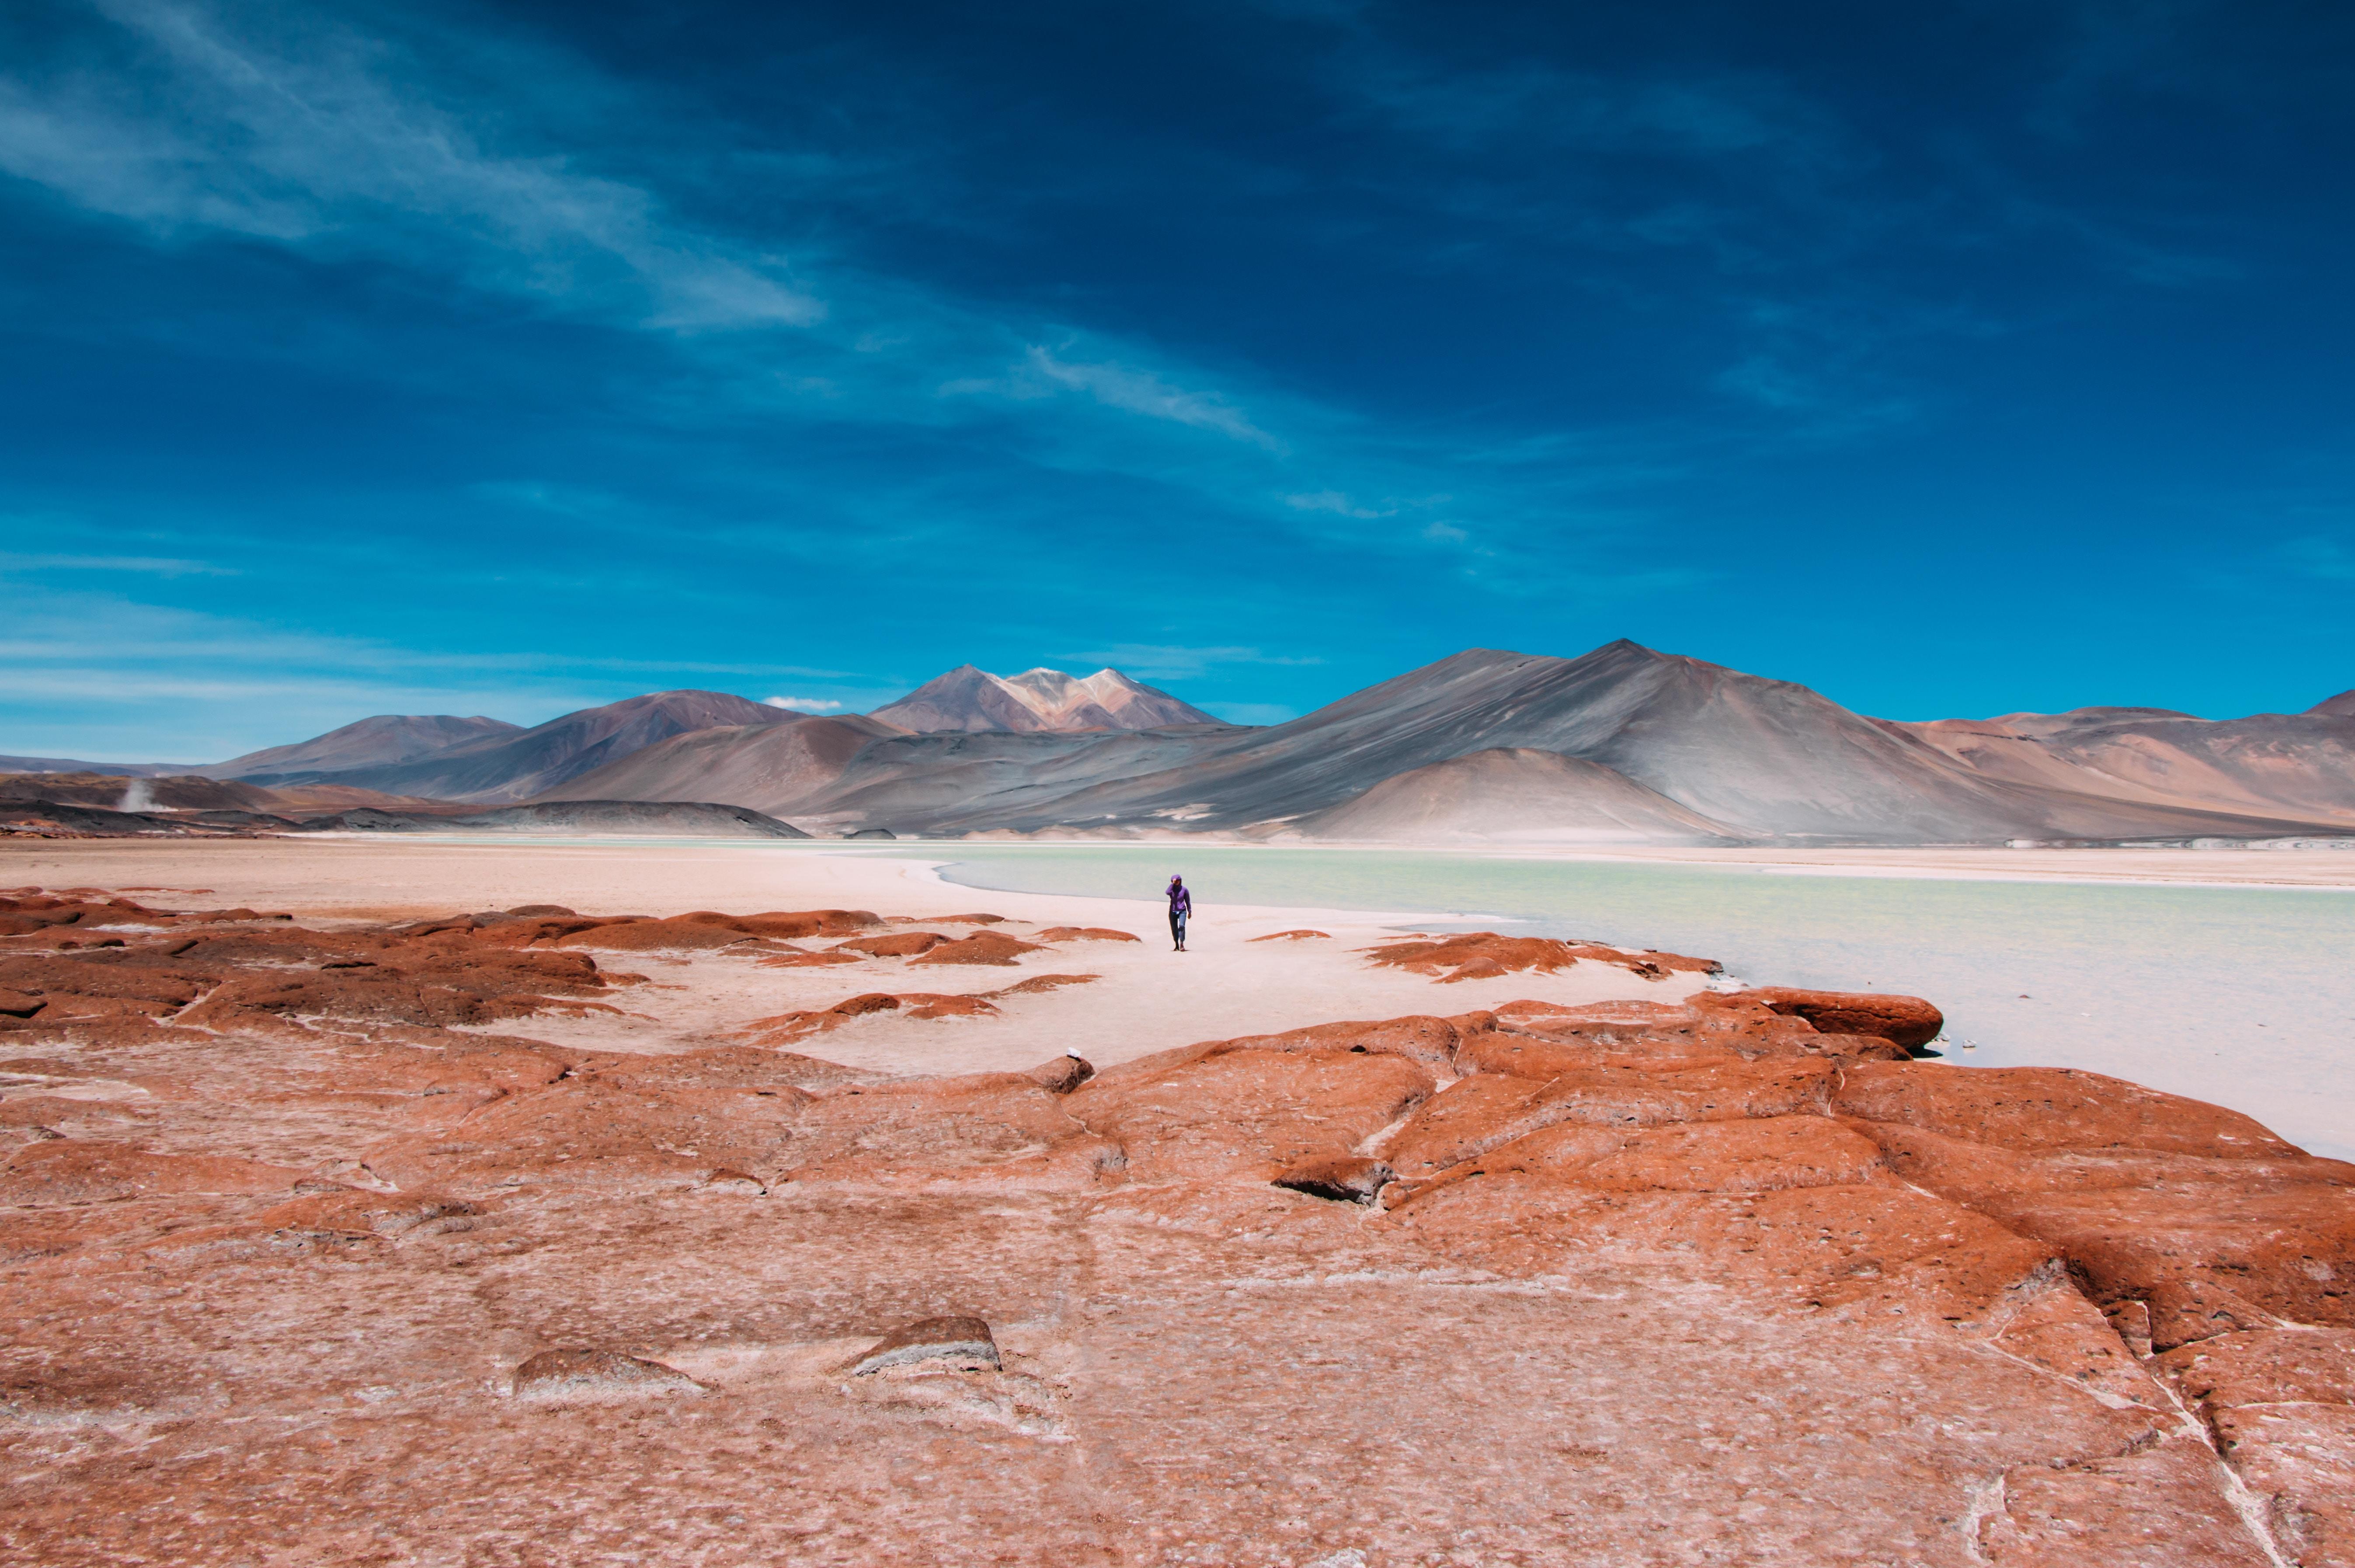 Person walks toward mountains on the horizon of the Atacama Desert